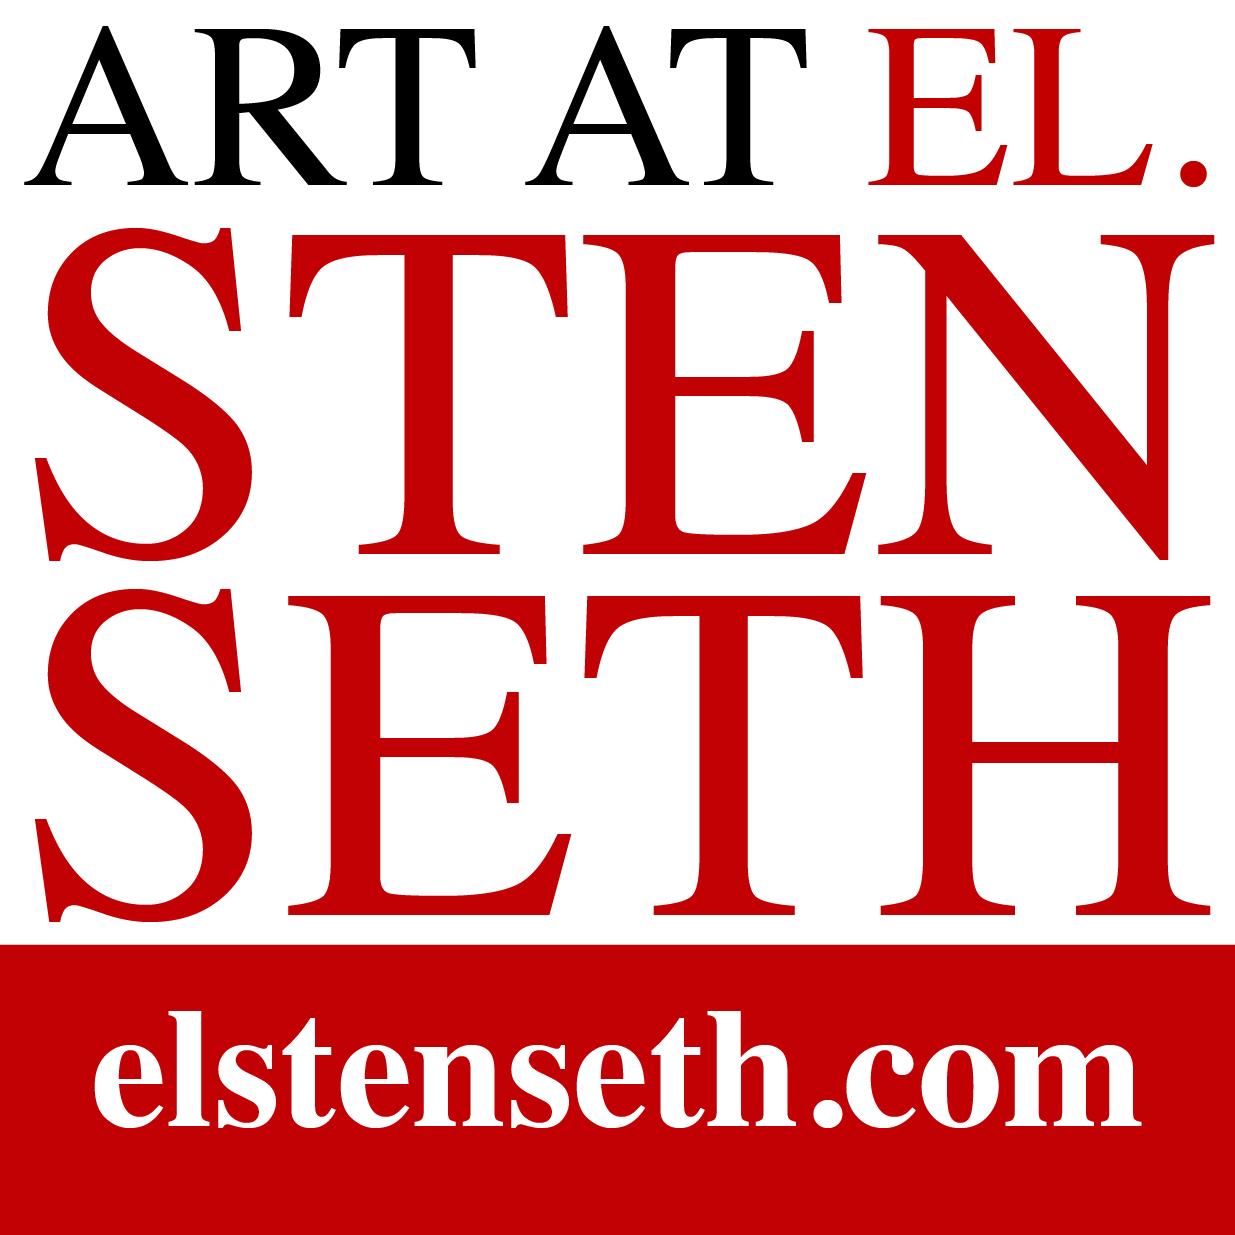 Galleri El.Stenseth